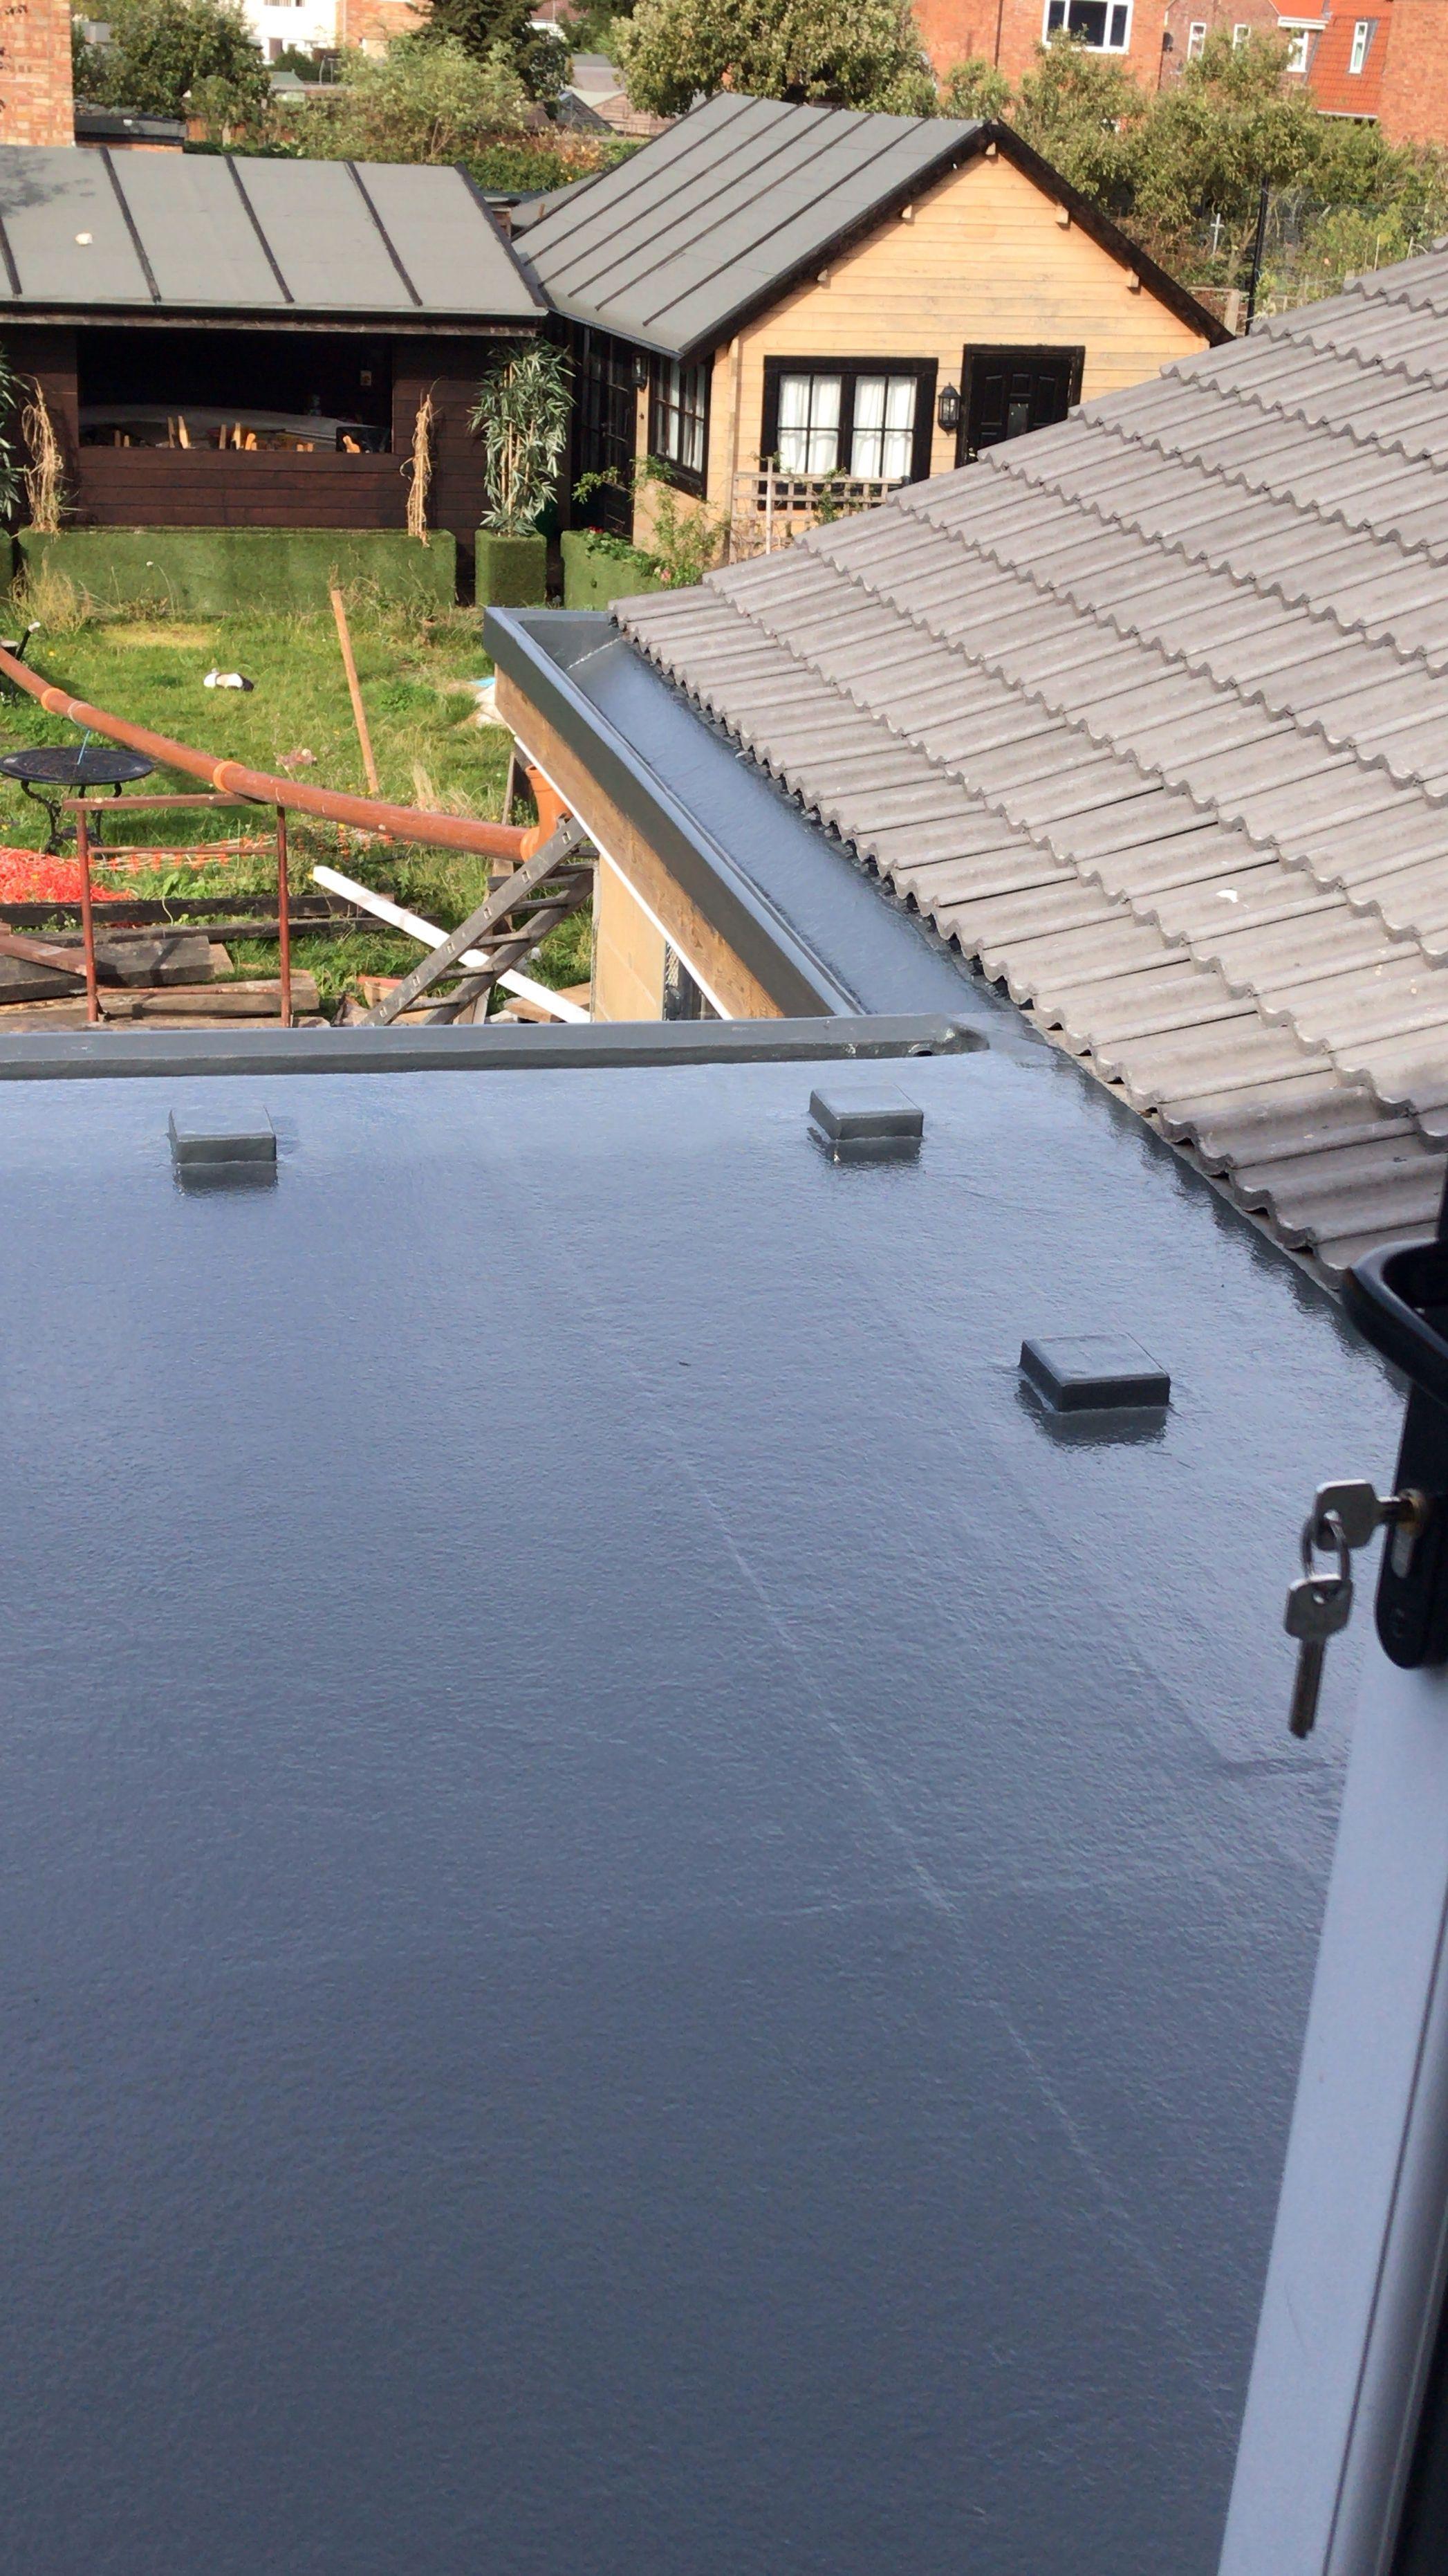 Grp Fibreglass Flat Roof Terrace In 2020 Fibreglass Roof Flat Roof Fibreglass Flat Roof